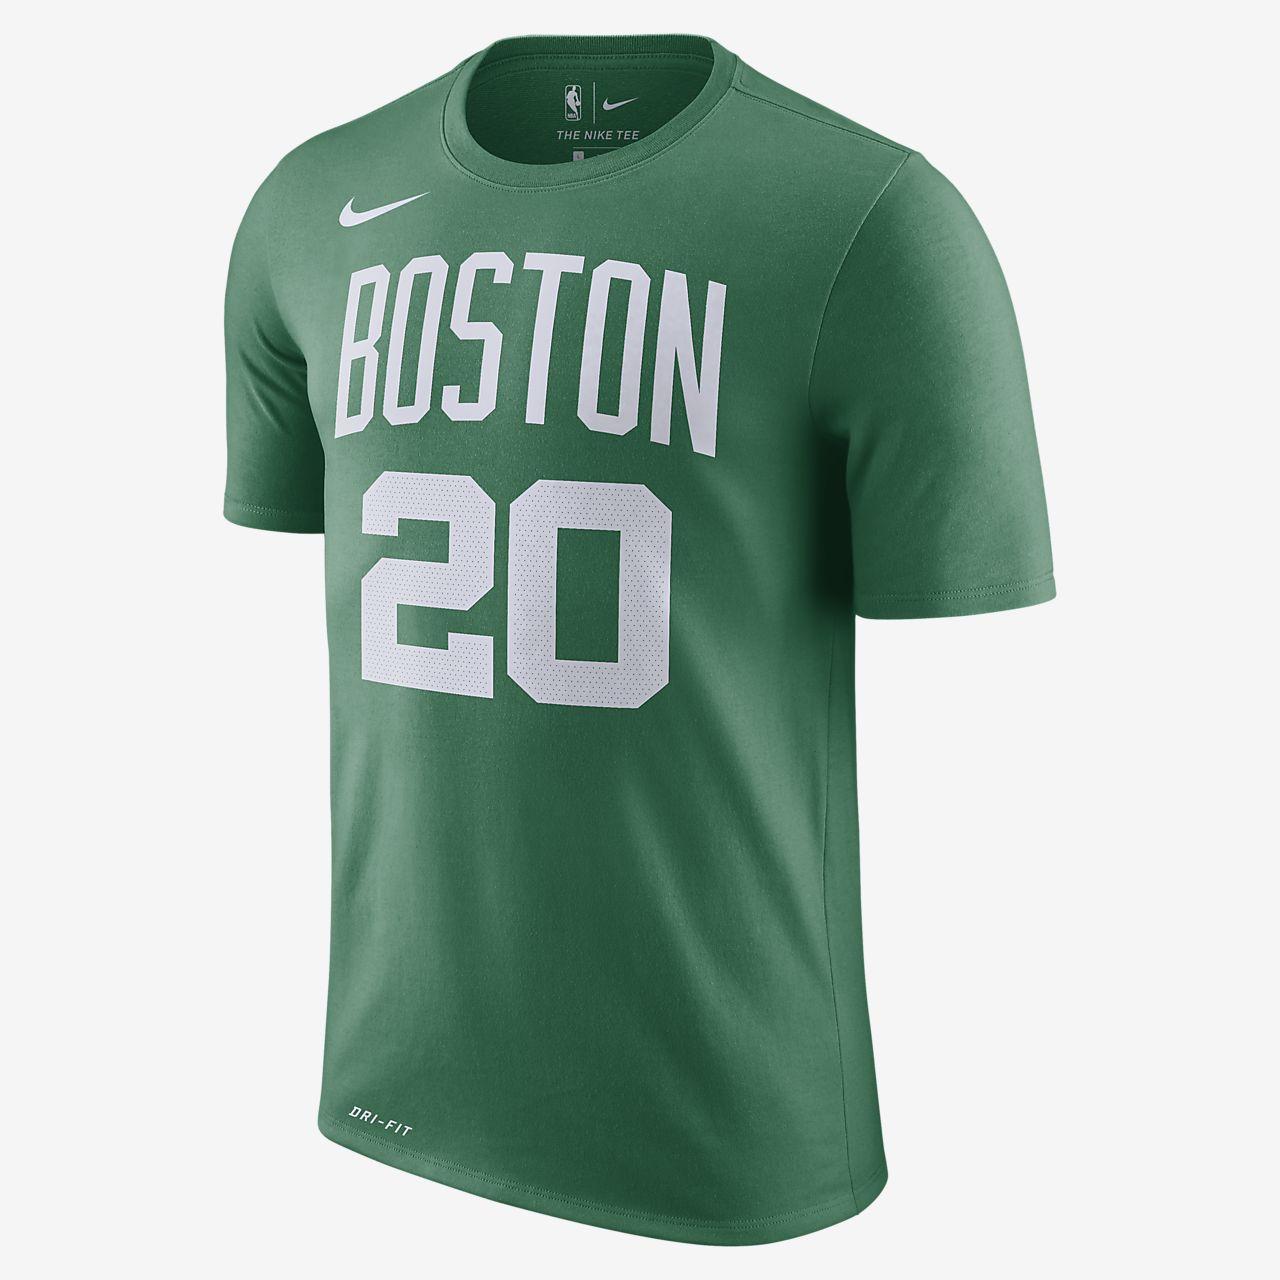 Gordon Hayward Boston Celtics Nike Dri-FIT Men s NBA T-Shirt. Nike.com 8f986df55